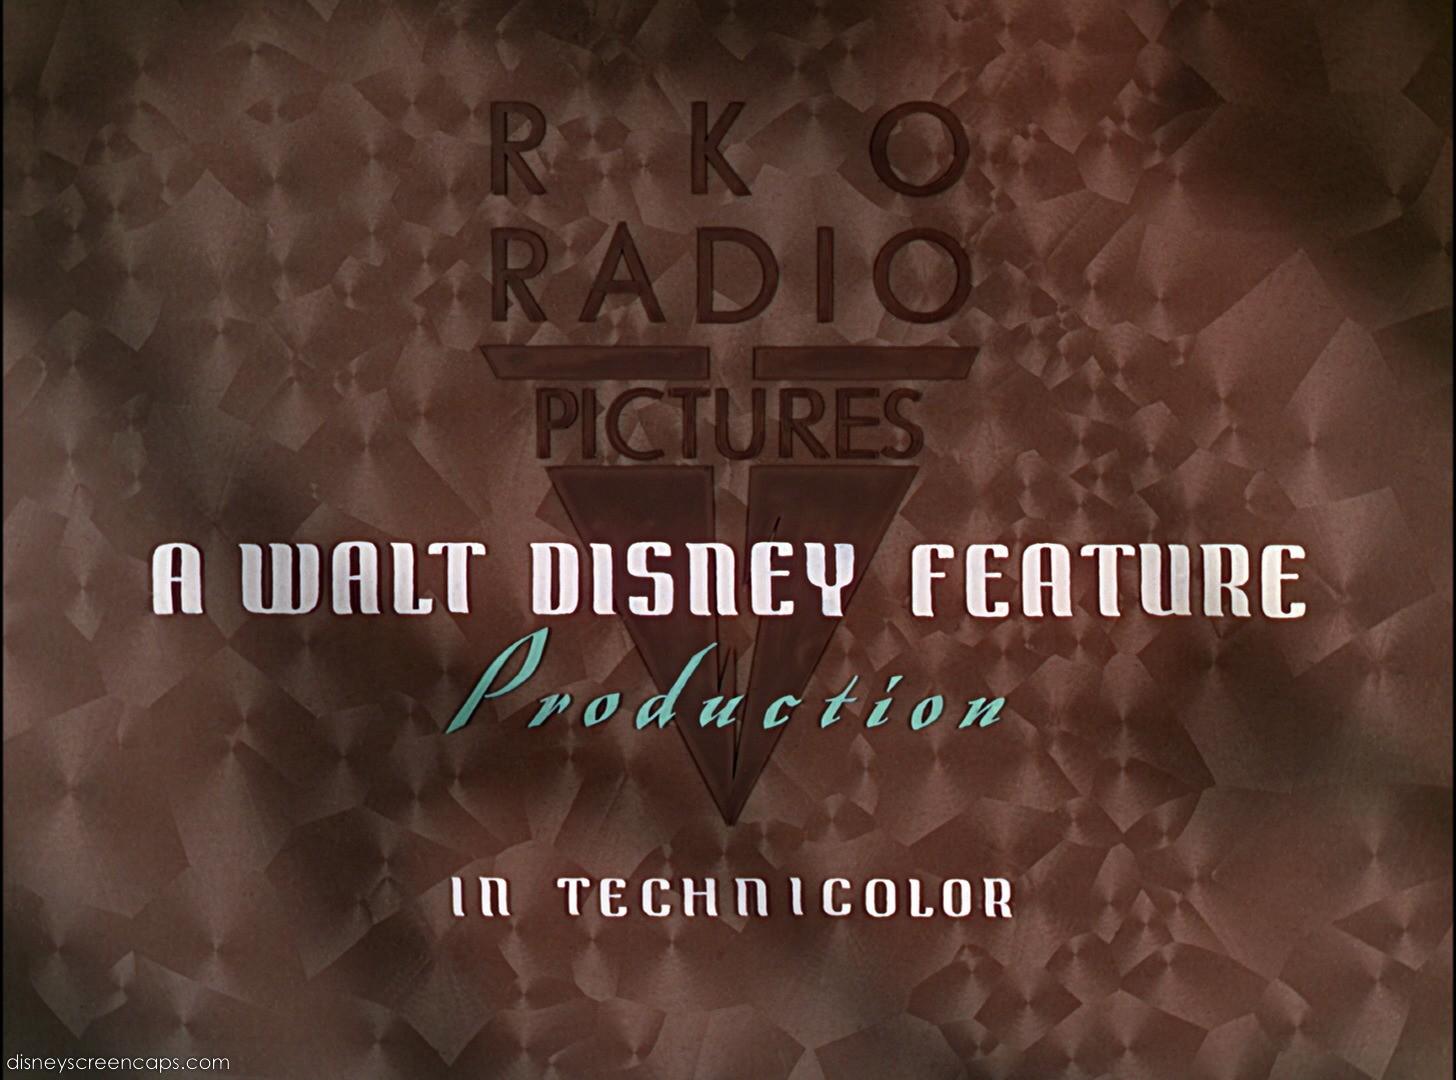 Rko-logo Rko Radio Pictures